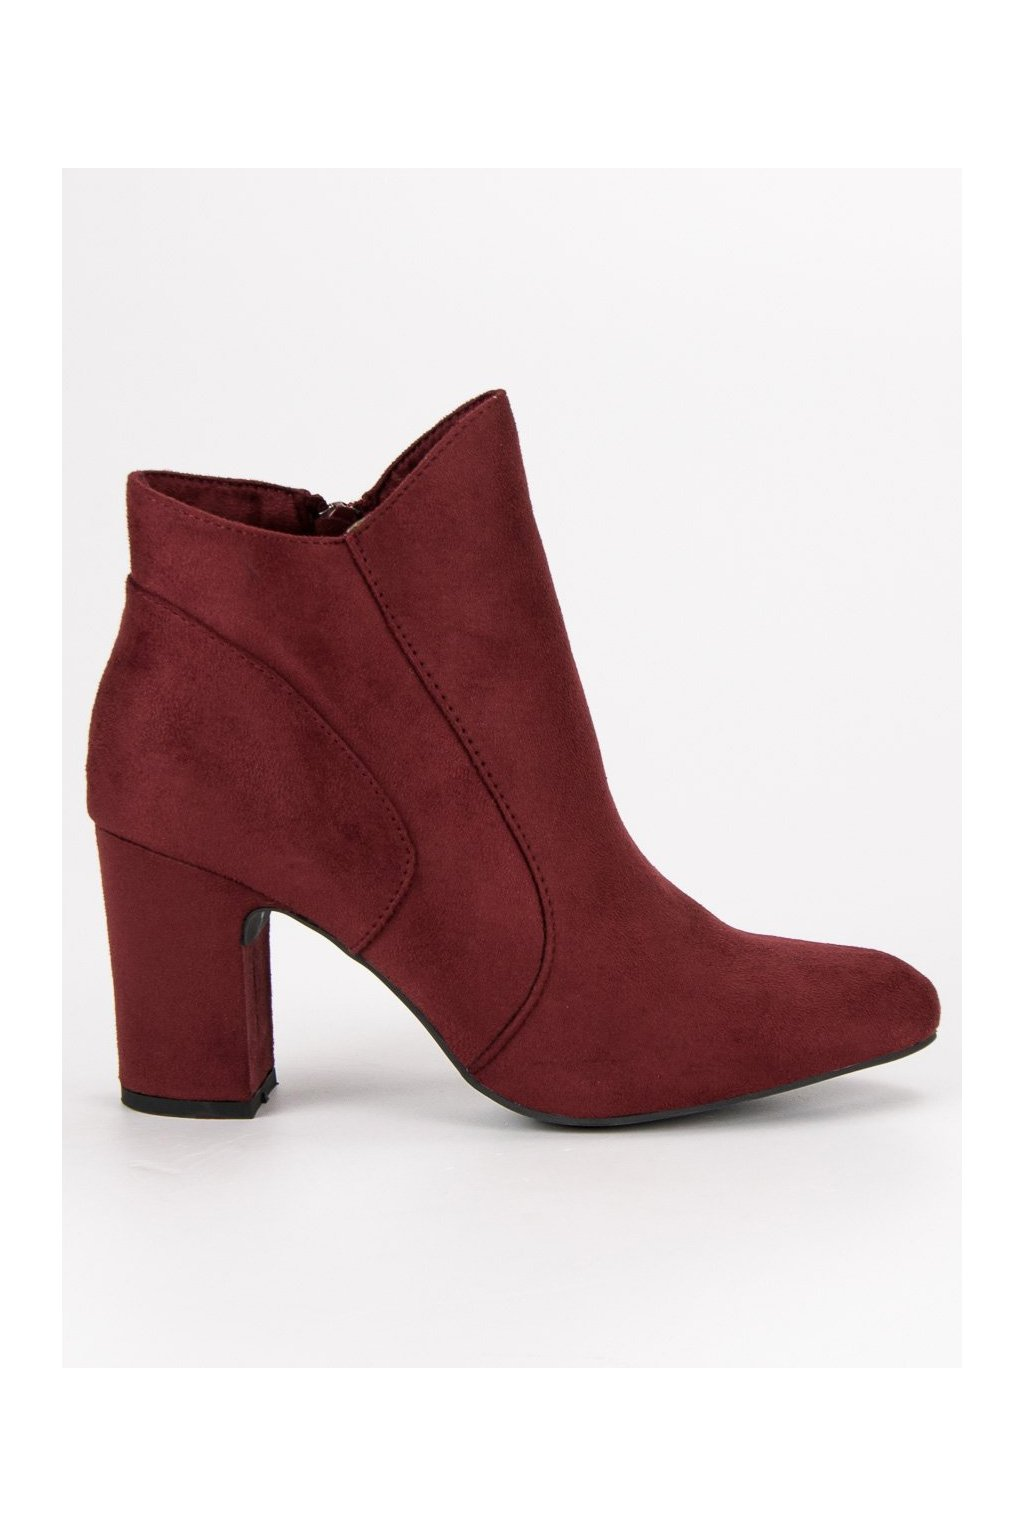 Elegantné topánky červené členkové čižmy so semišu Kylie 173612854d0